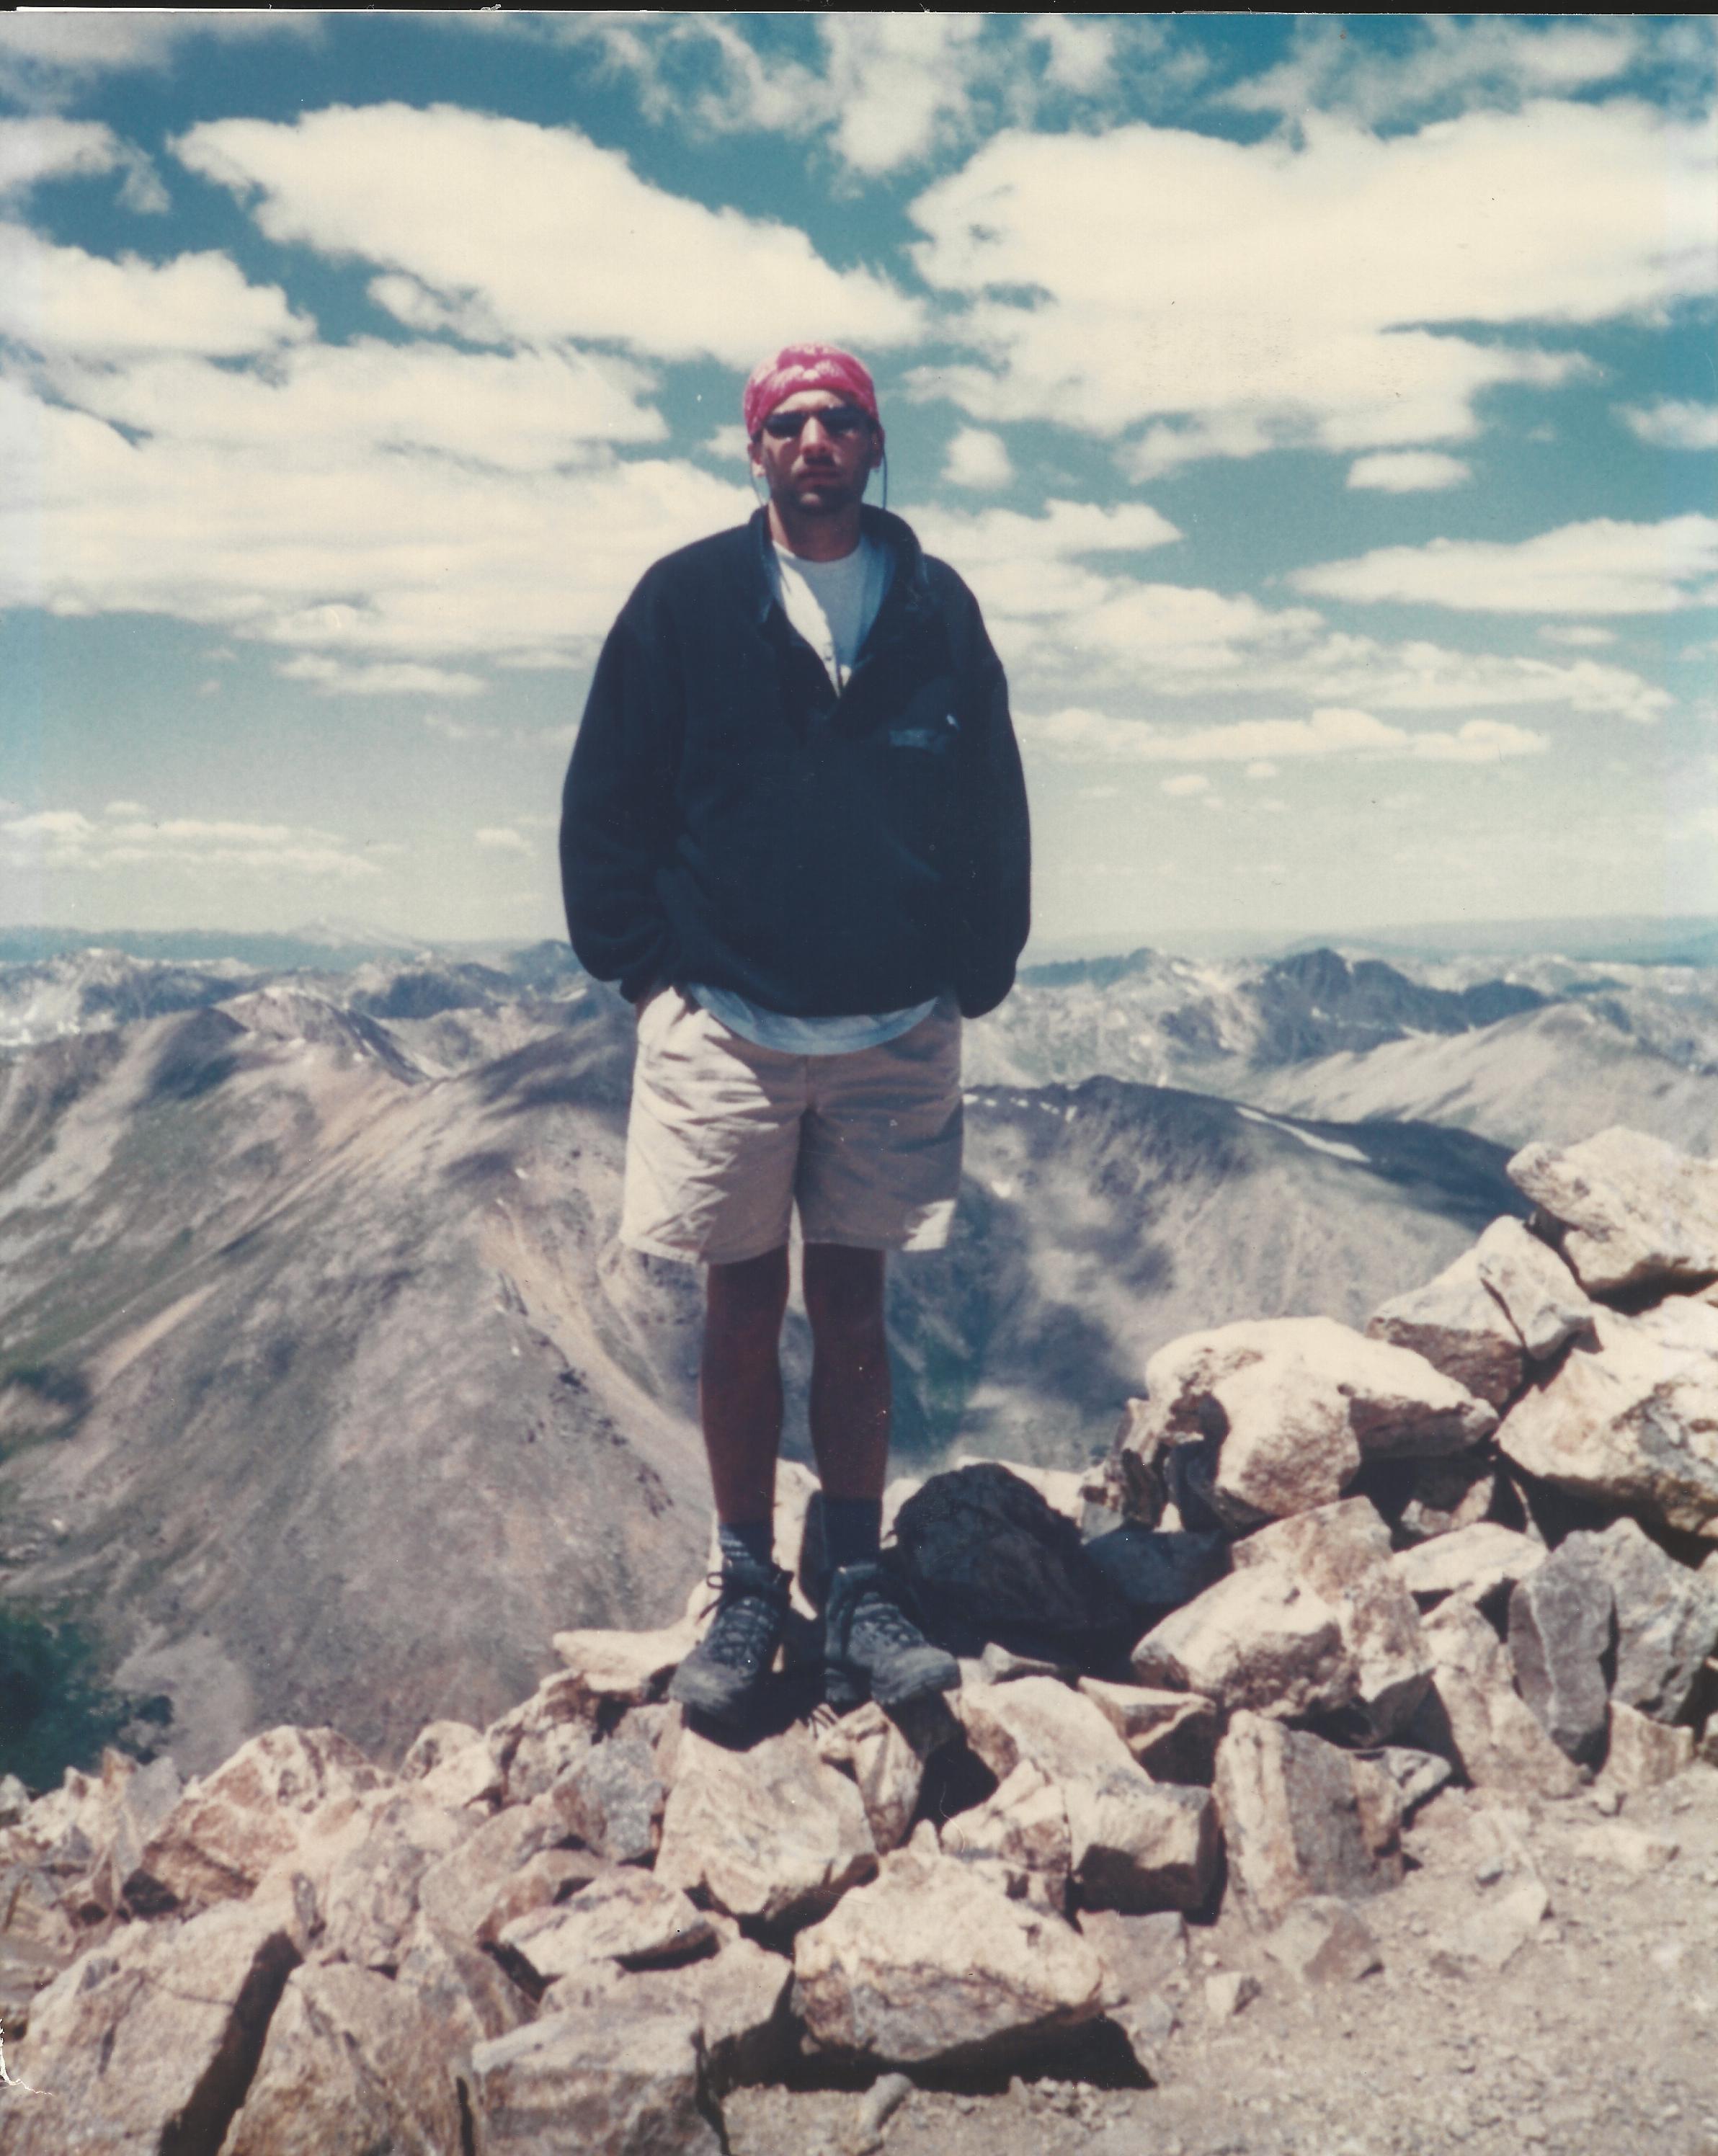 Mr. Emmons on top of Mt. Elbert in Colo.